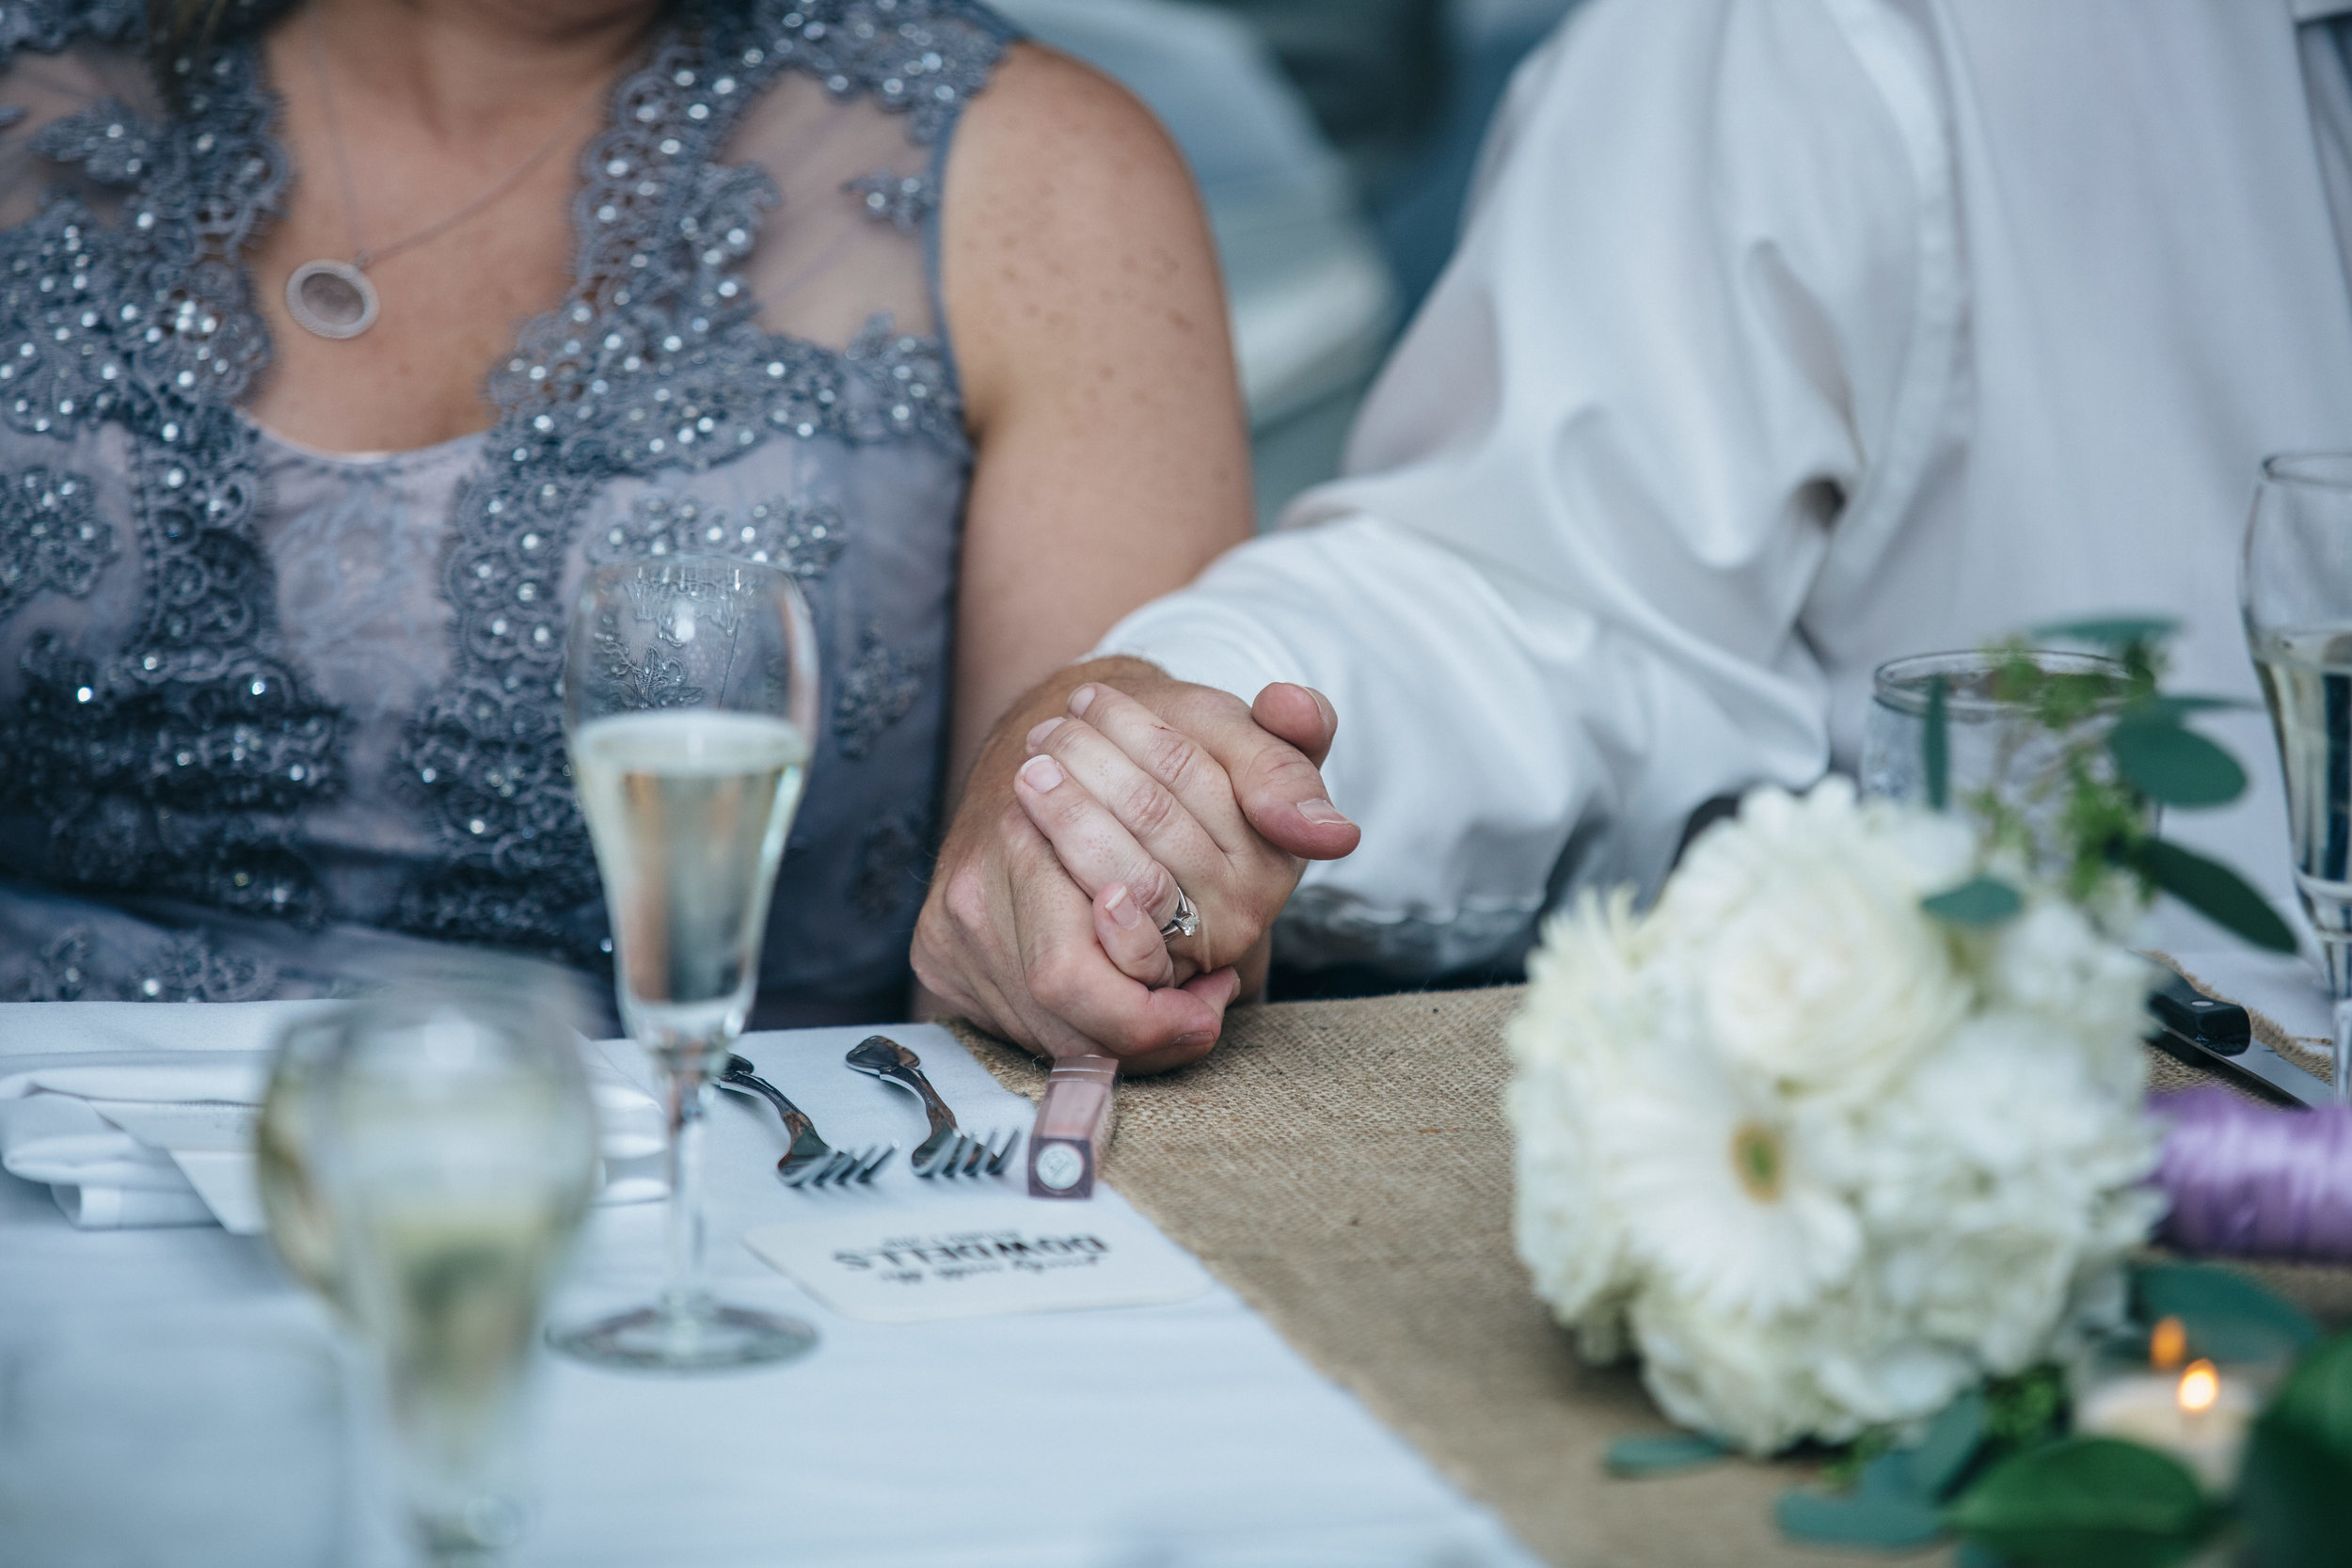 Purple lace reception dress on bride at wedding reception in Toledo, Ohio.